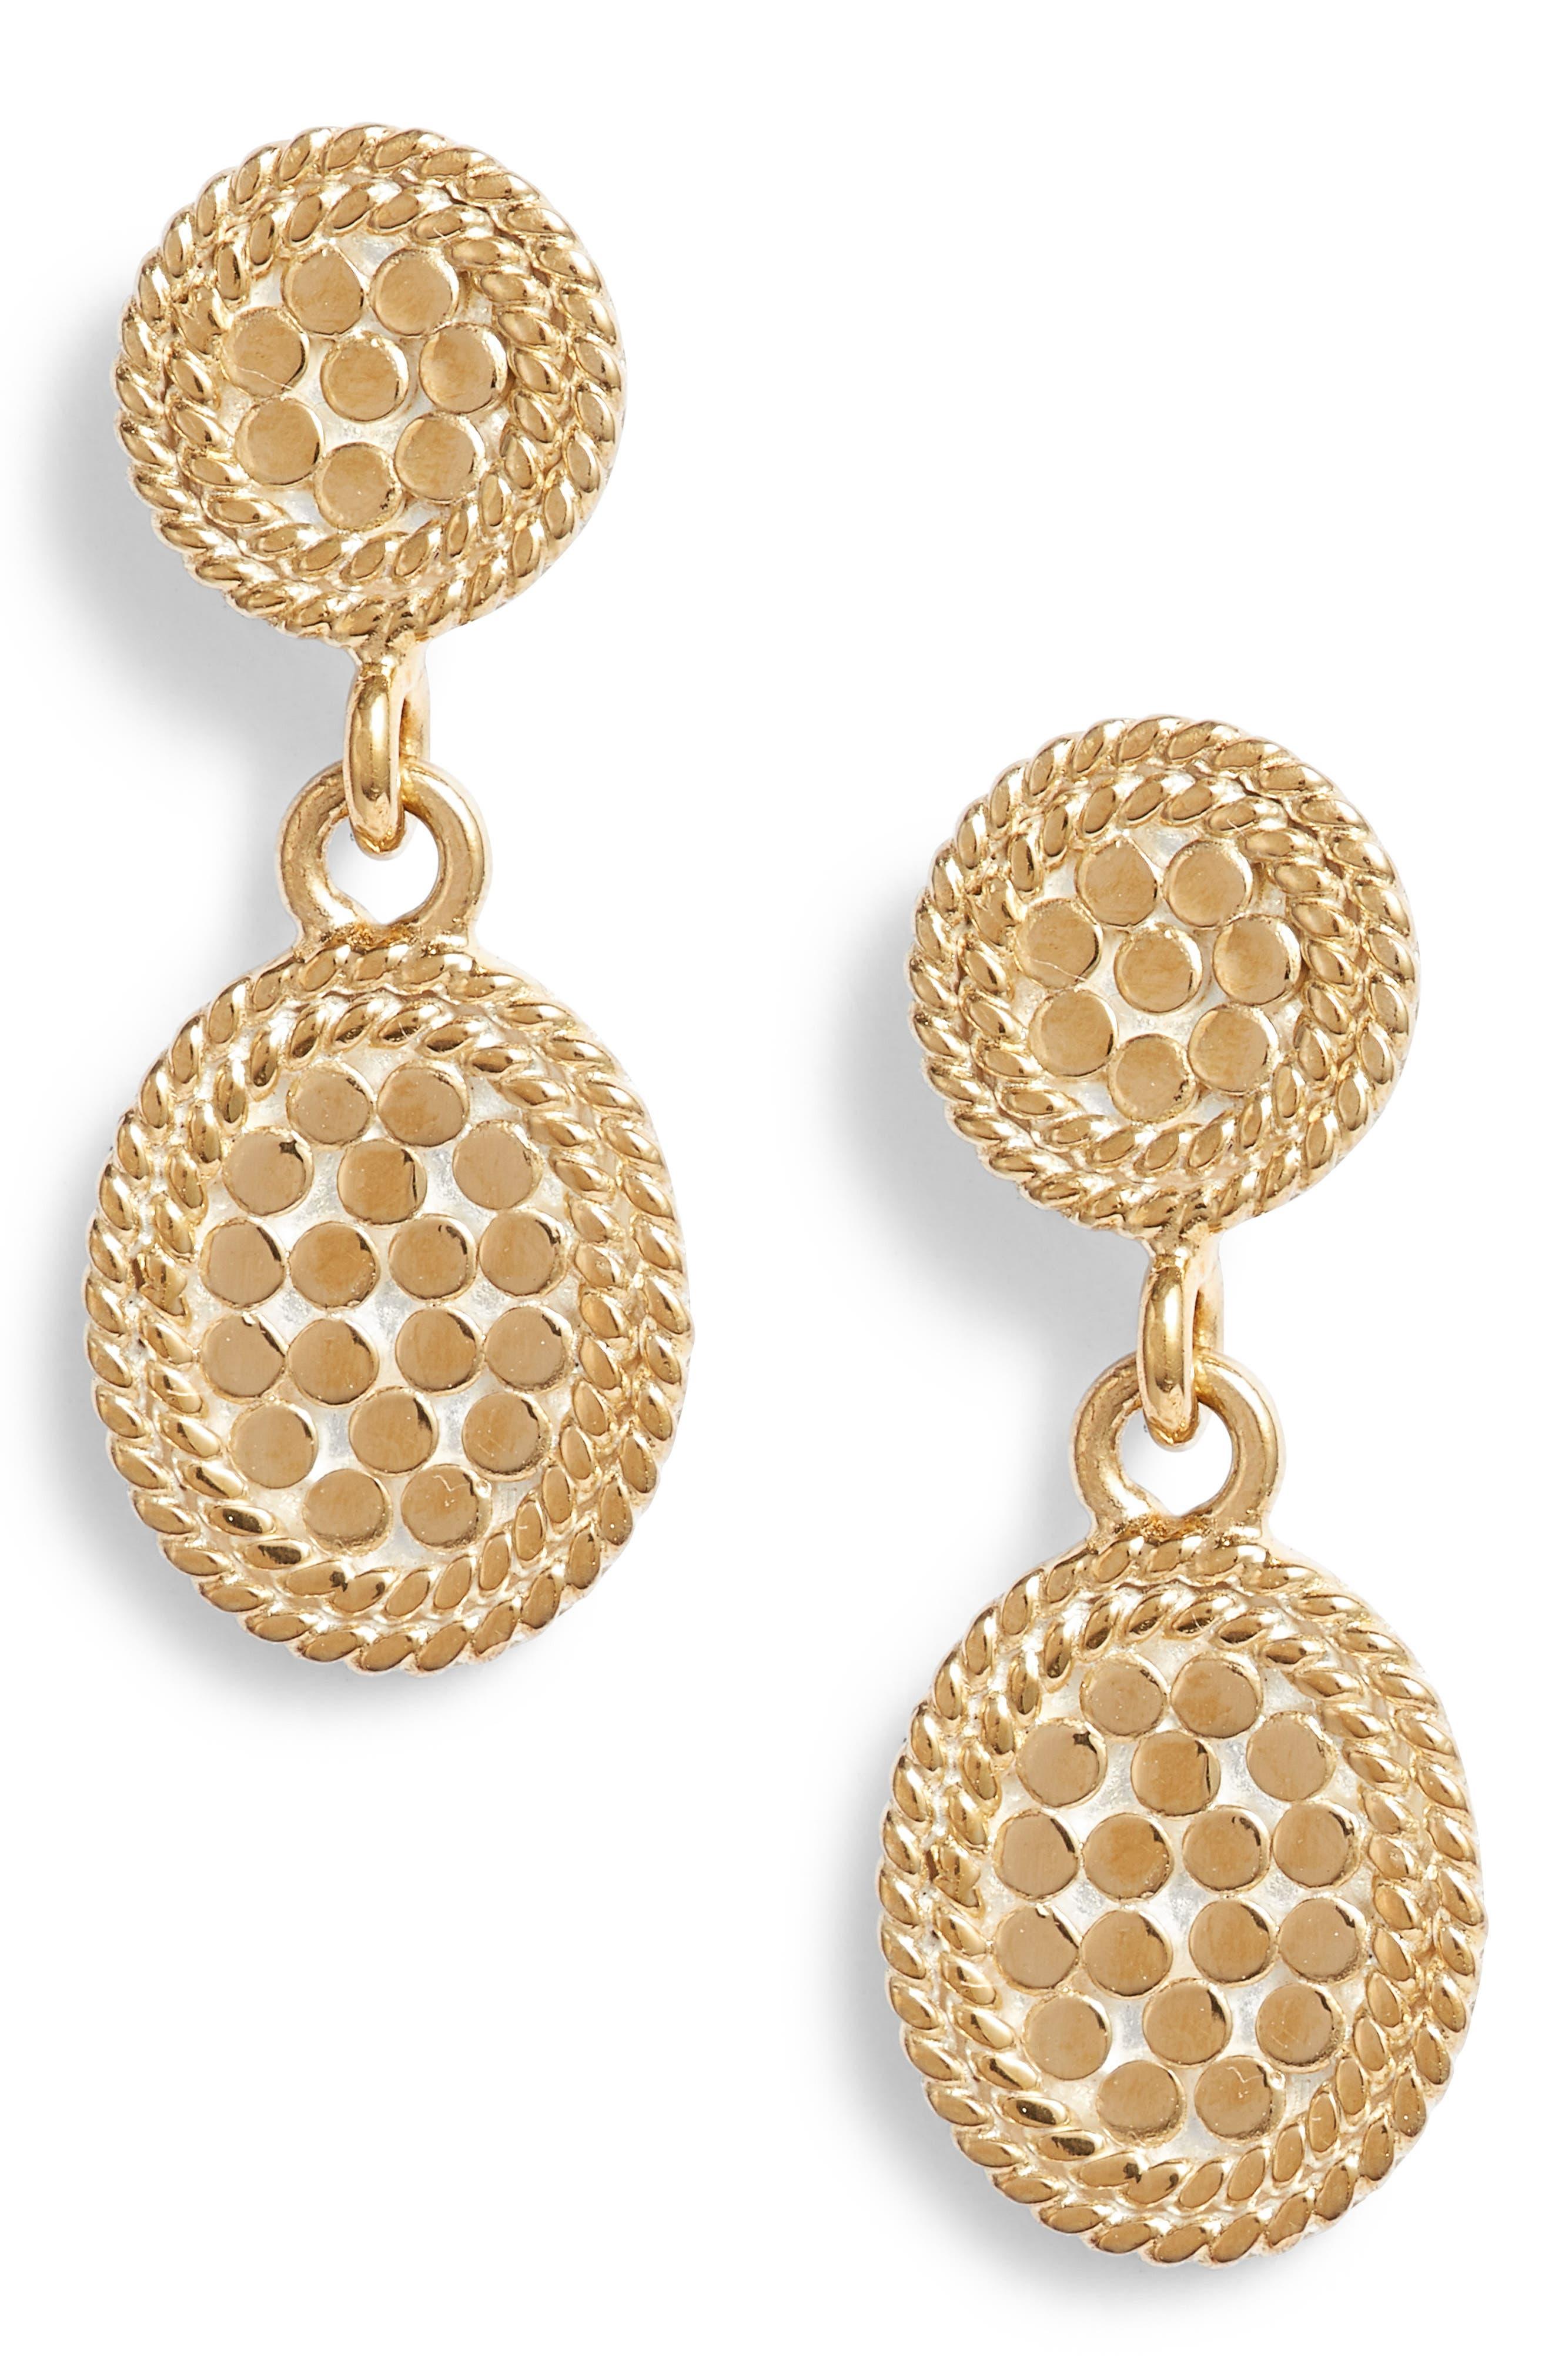 Gold Double Drop Oval Stud Earrings,                             Main thumbnail 1, color,                             710